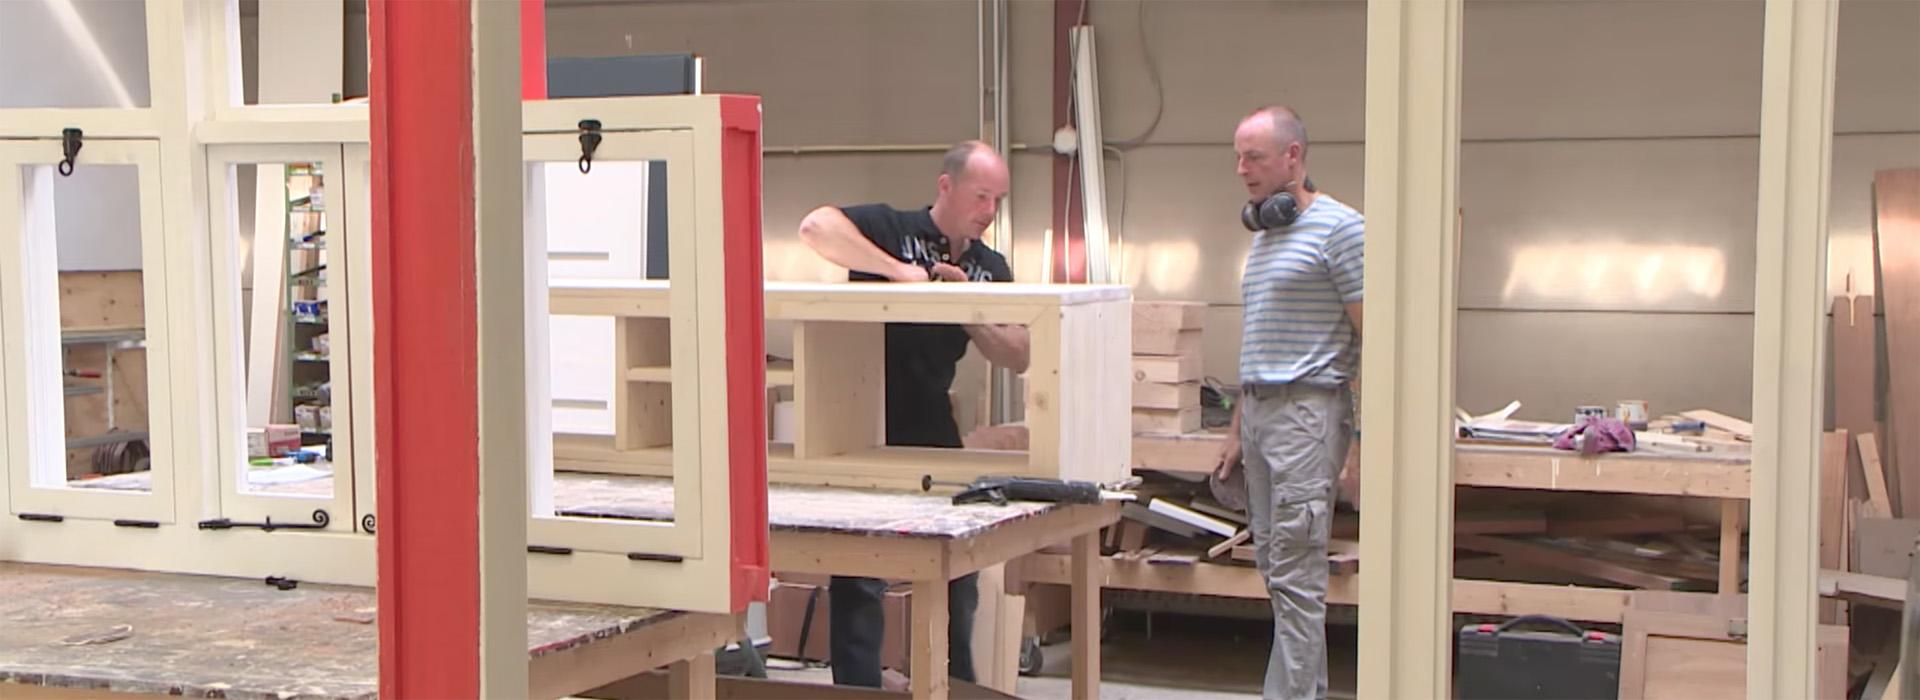 Werkplaats steigerhouten meubels